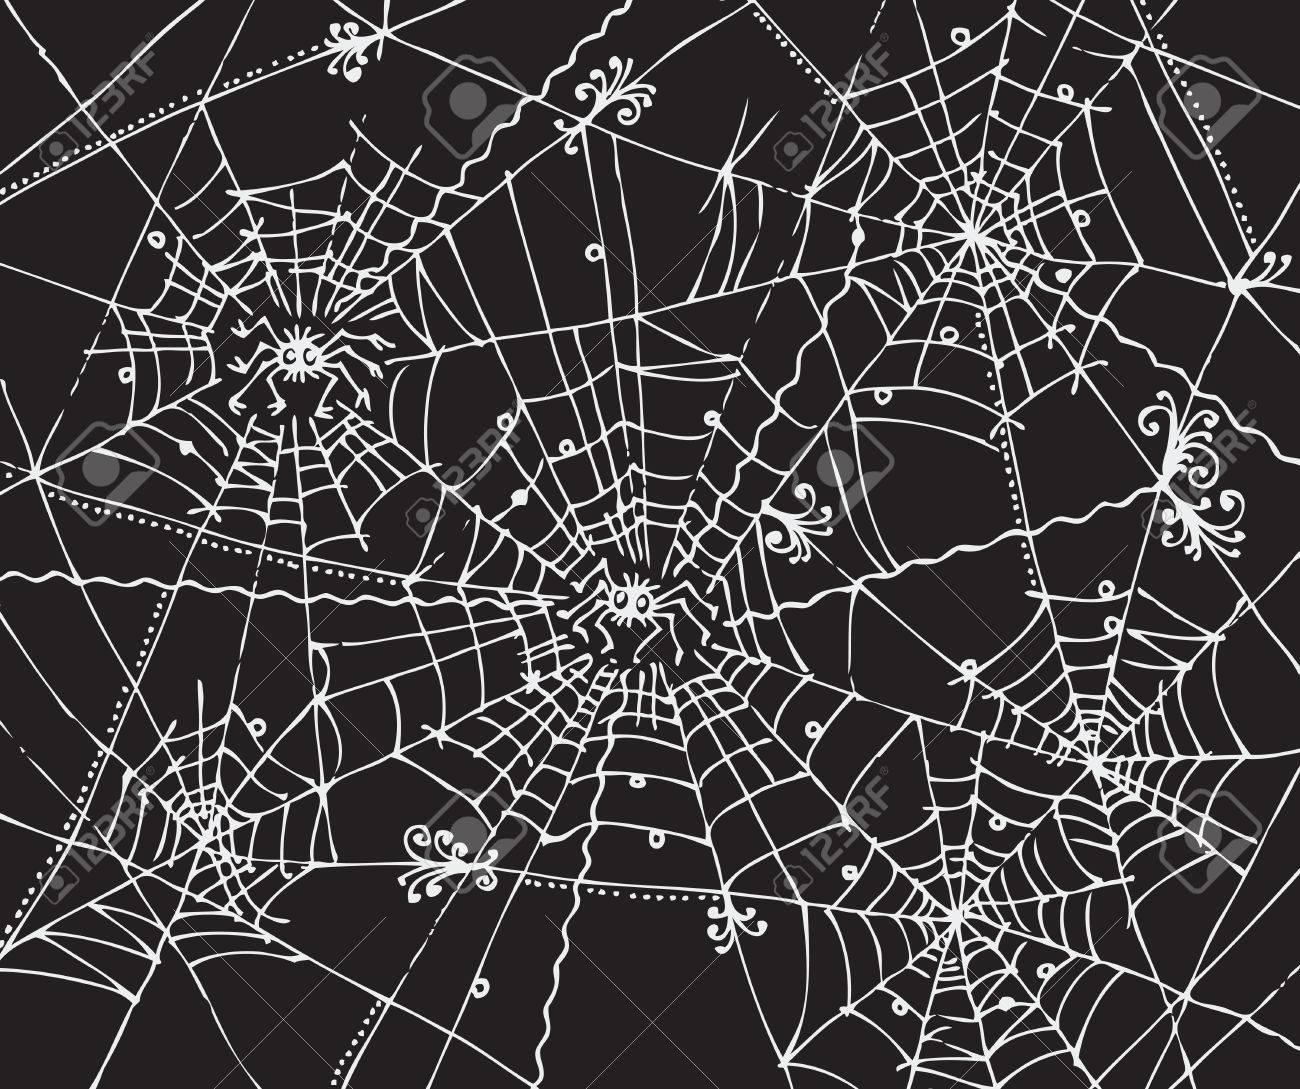 Web background 318 Eau-forte black-and-white decorative vector illustration Stock Vector - 7989519